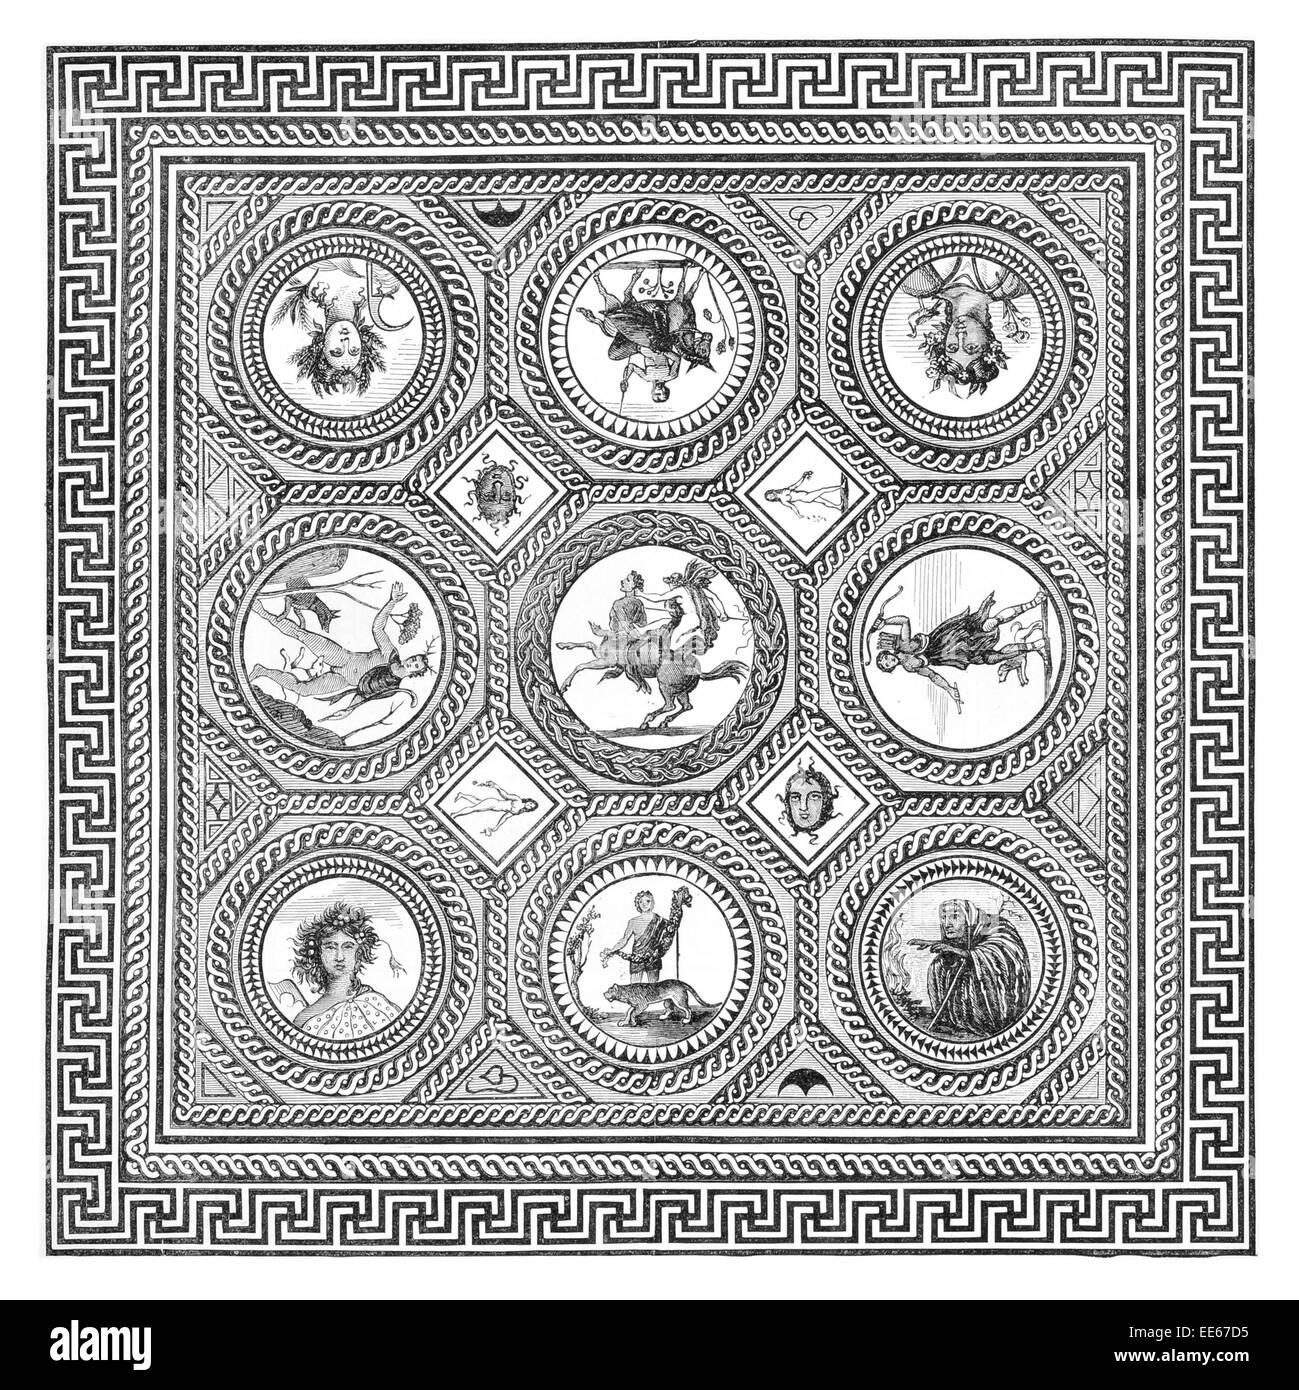 Roman design stock photos roman design stock images alamy mosaic pavement messrs hare bristol tessera roman design ceramic tile tiles floor flooring ancient corinium mosaics dailygadgetfo Image collections